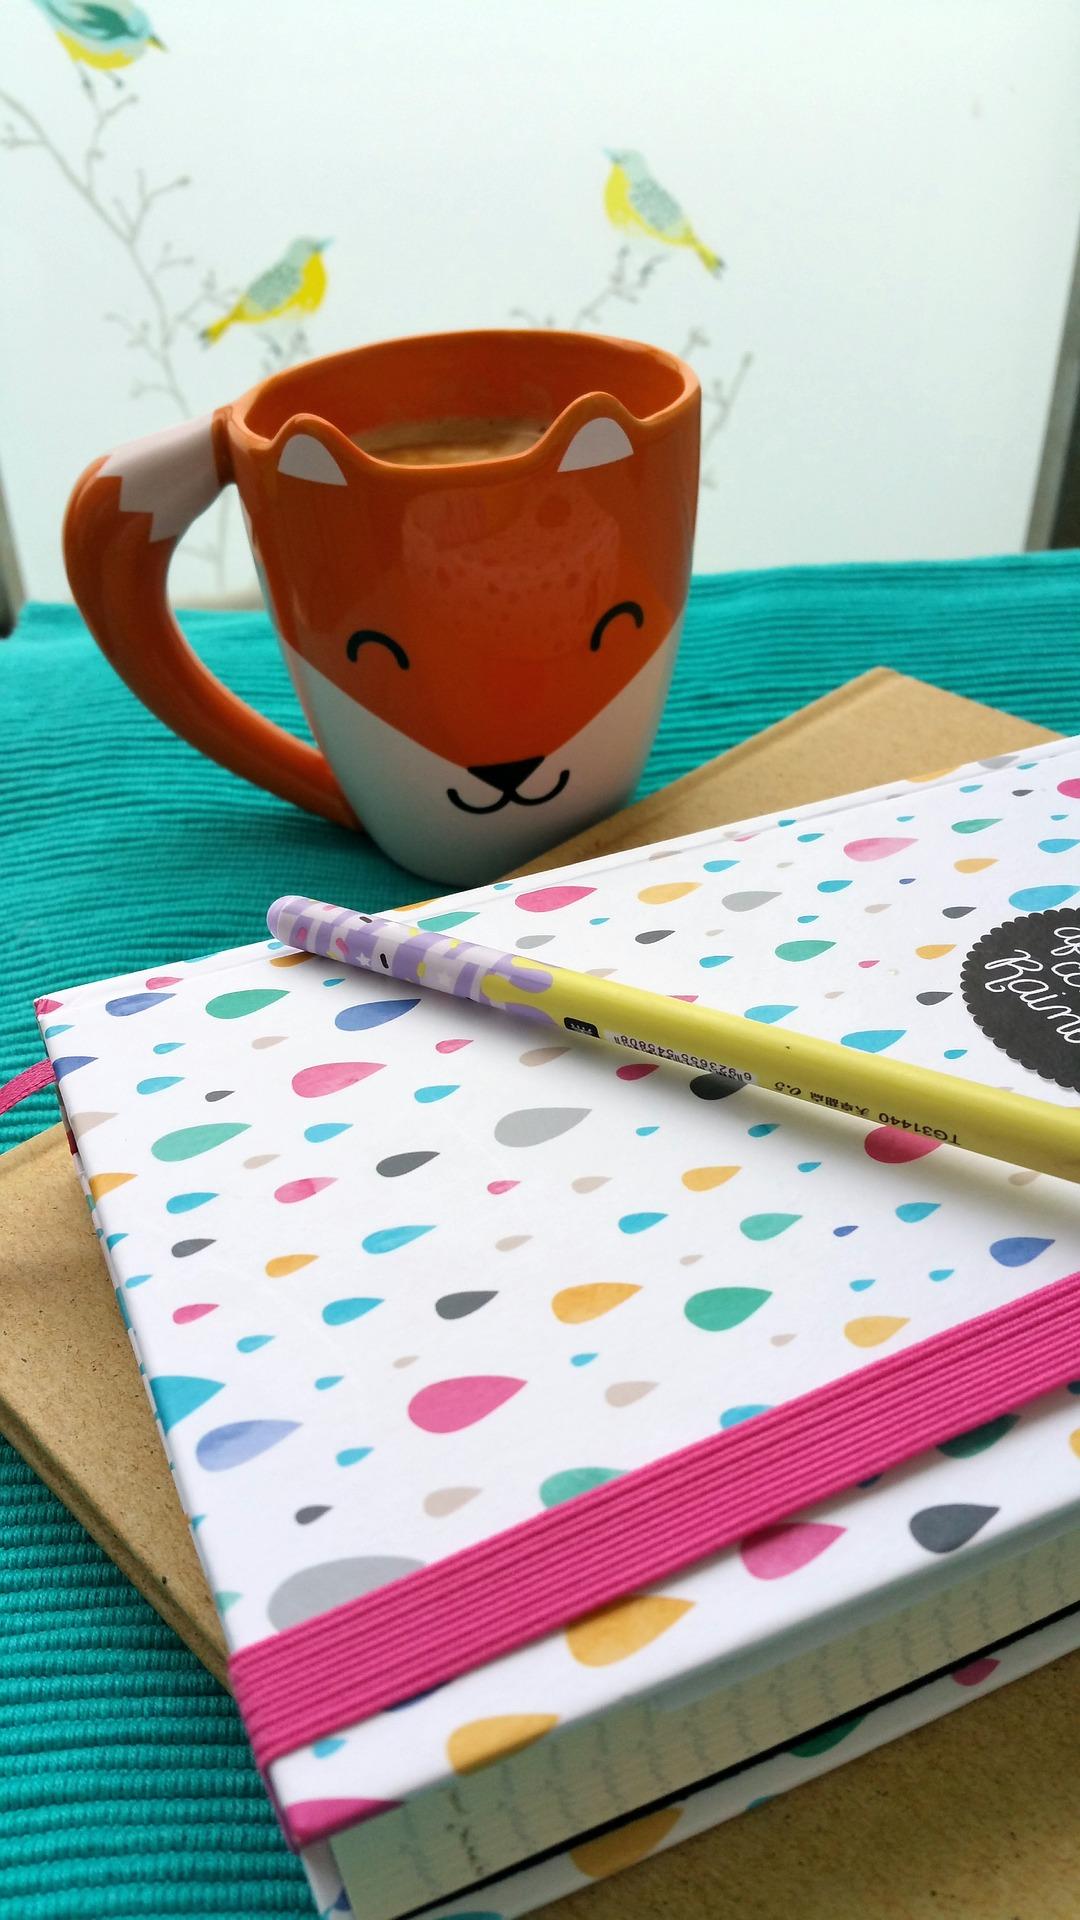 autumn schedule mug diary